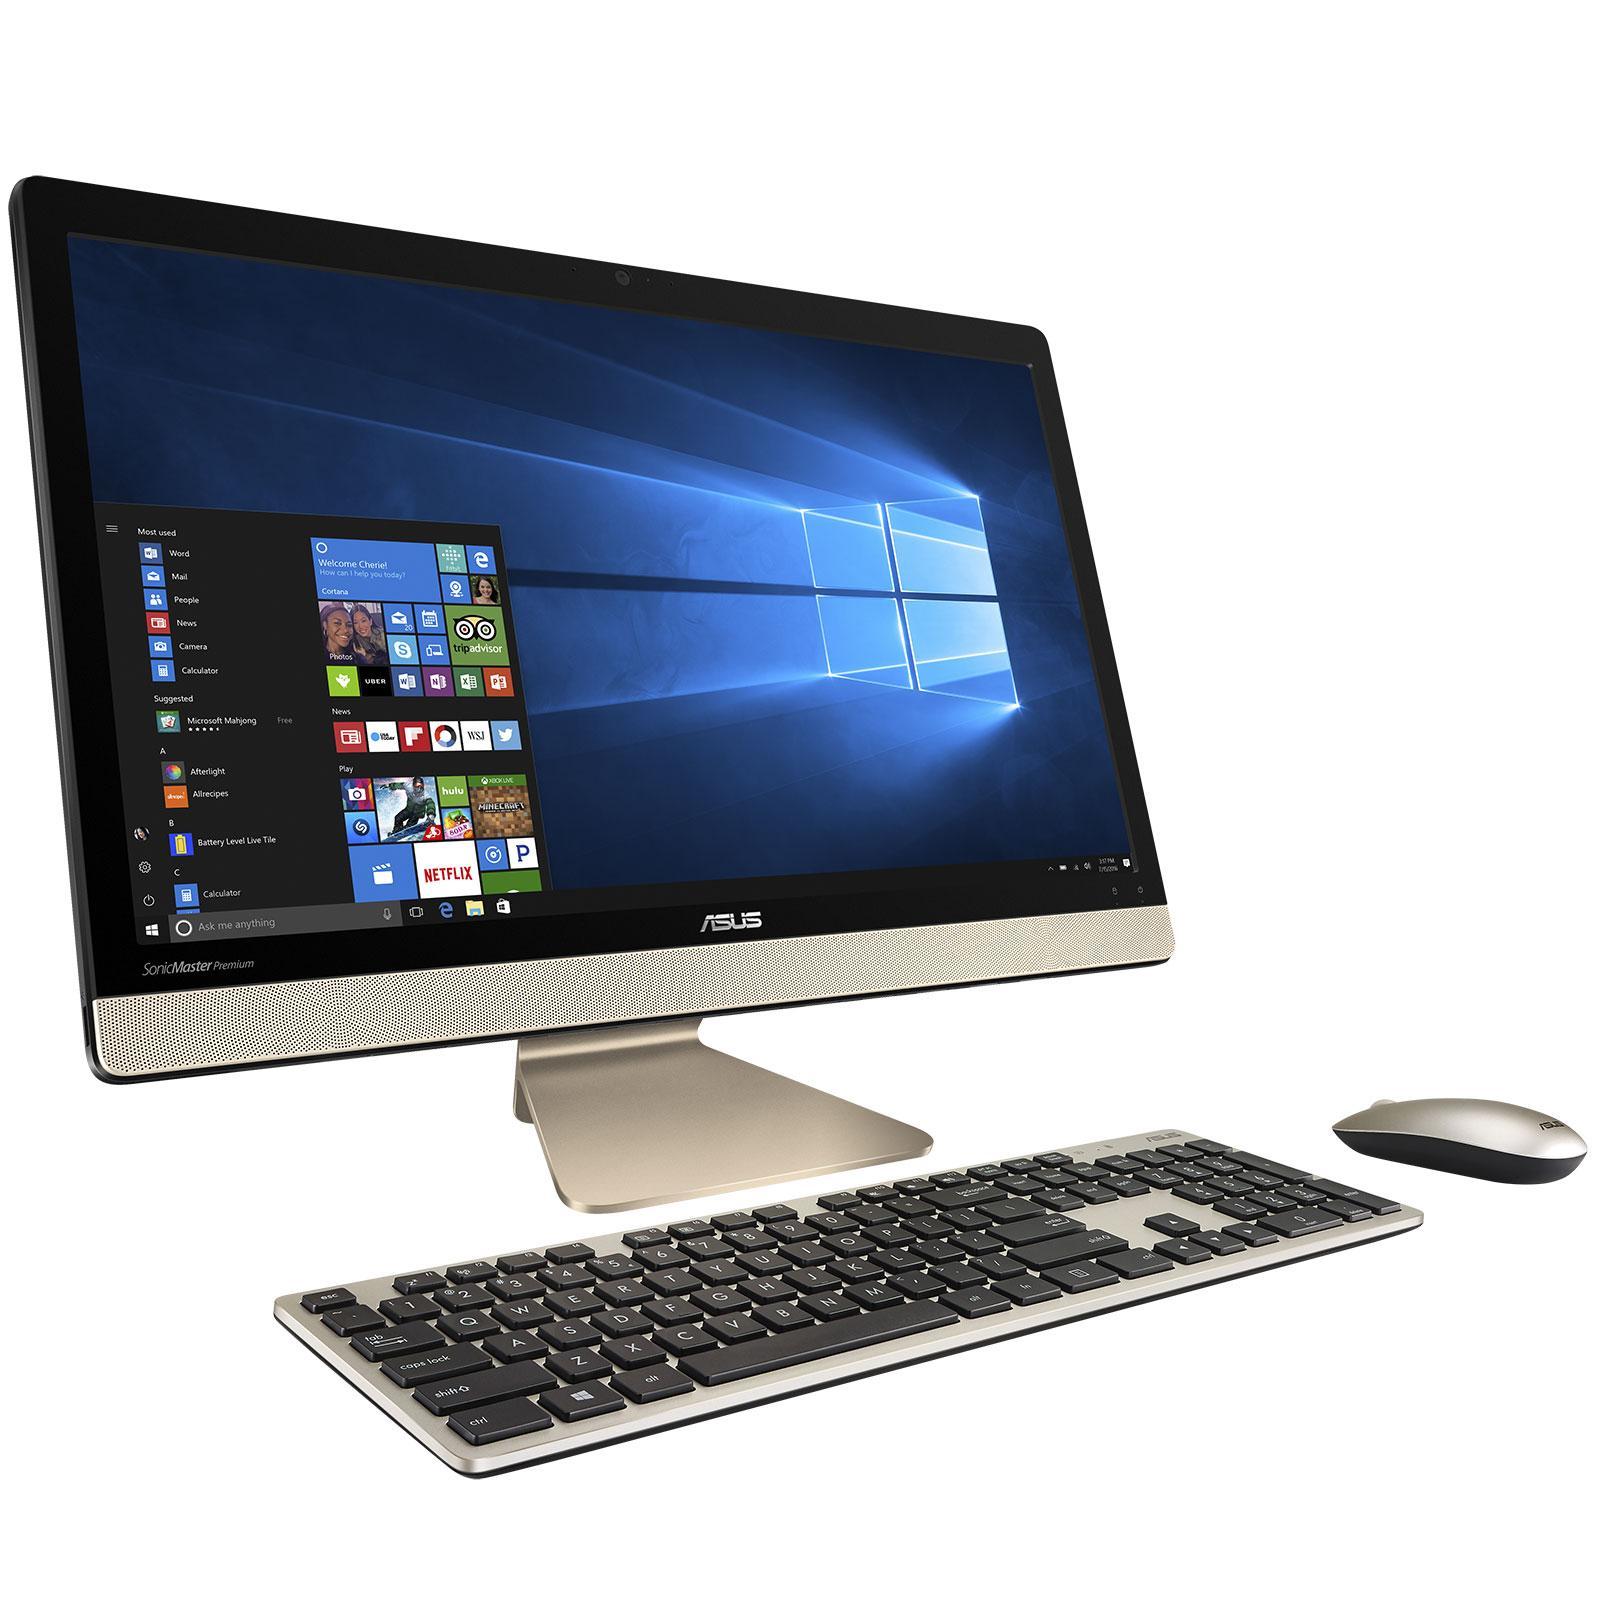 Asus Pro P2430ua Wo0815d 4gb Ram Intel Core I3 Hdd 500gb Fingerprint Wo0822d Black Pc All In One Vivo Aio V221 Ba031d